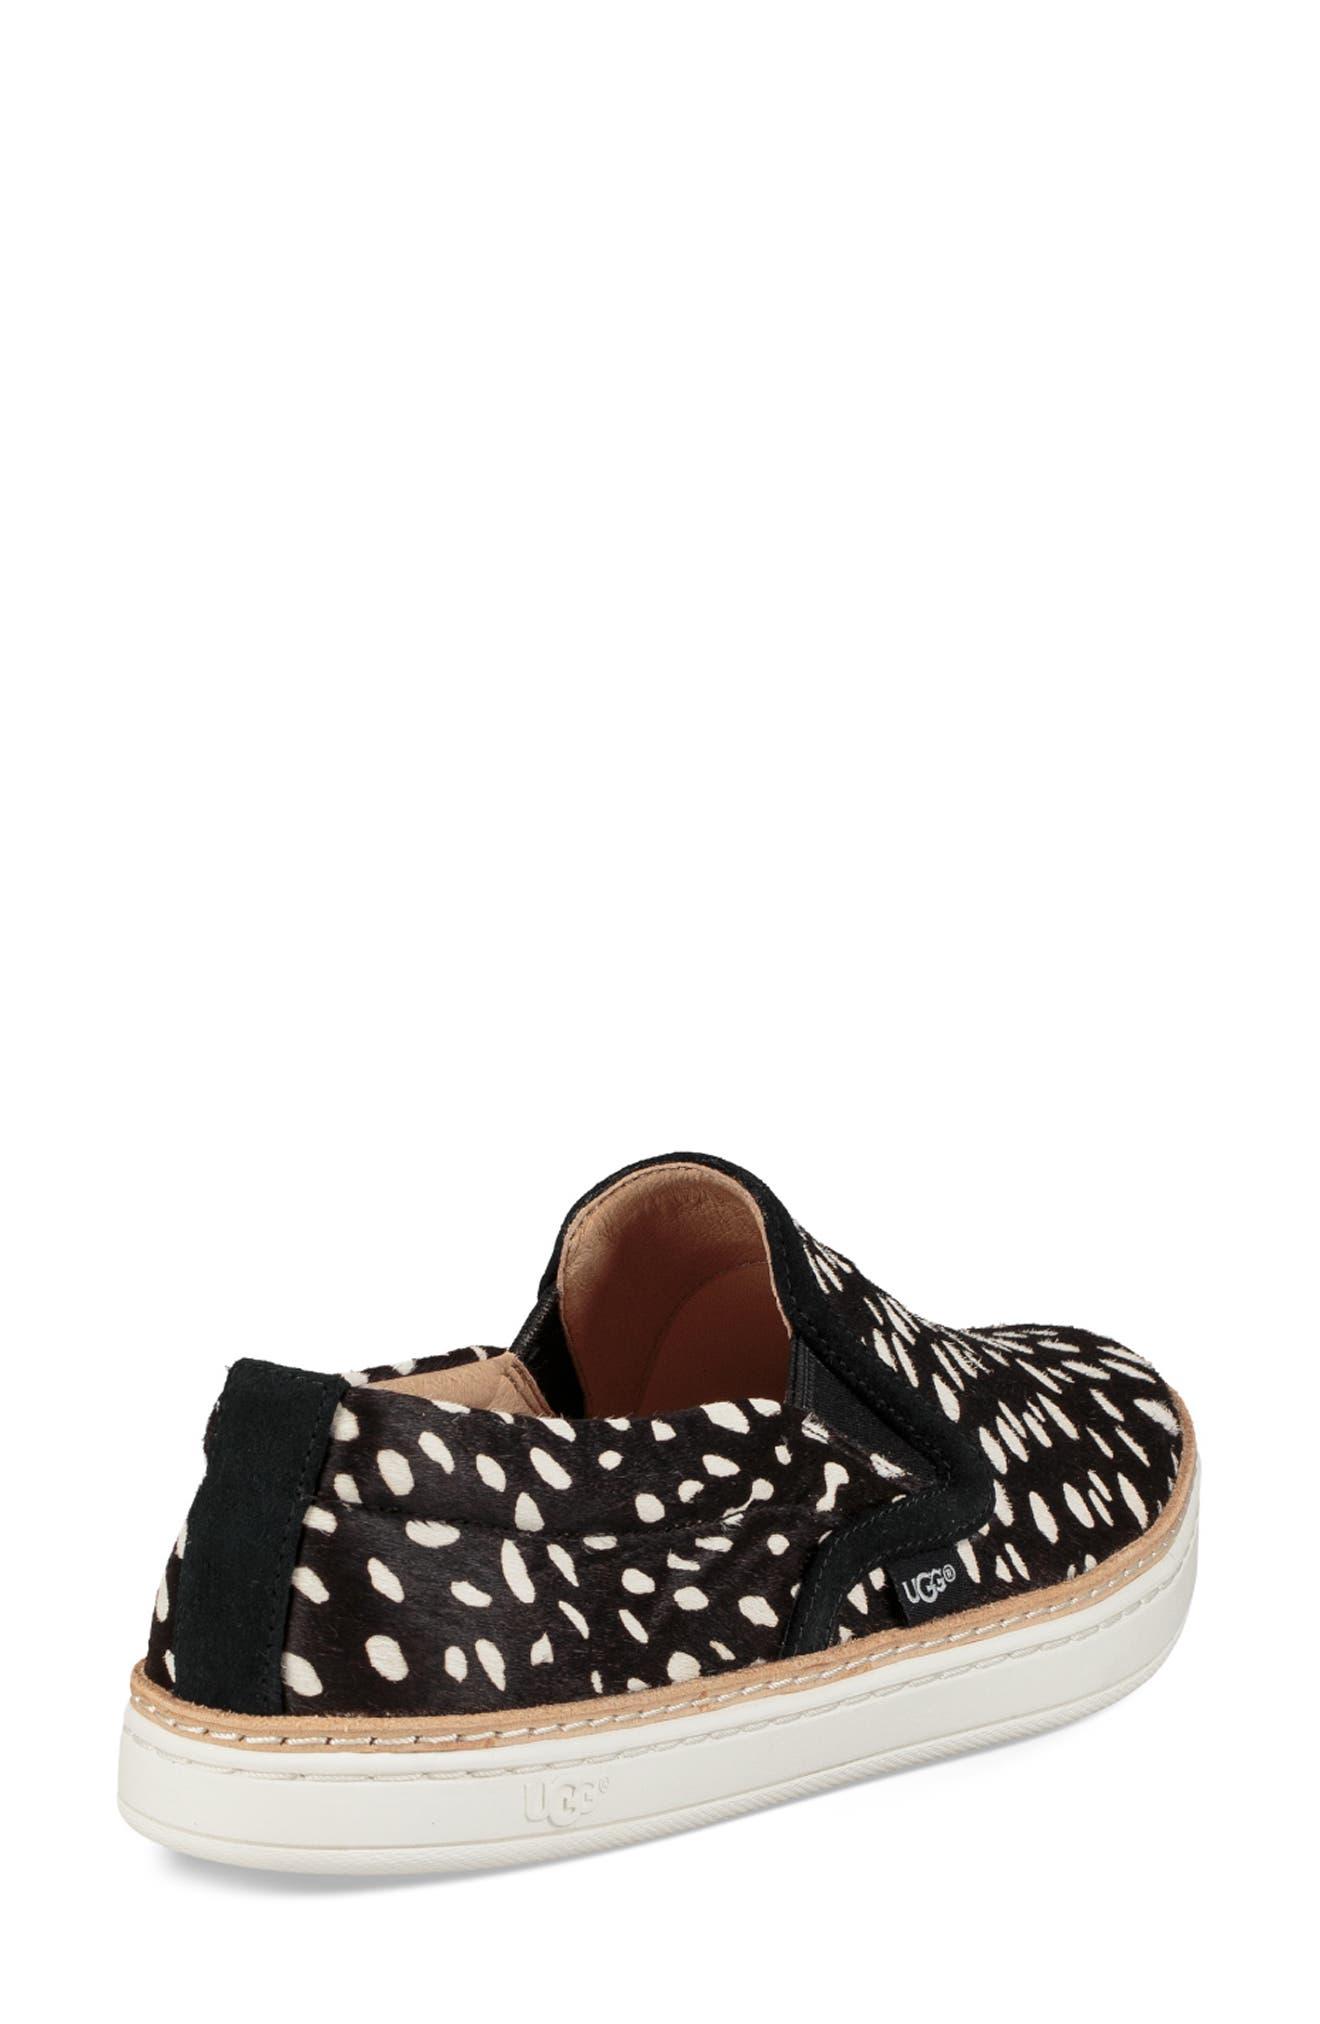 Soleda Genuine Calf Hair Slip-On Sneaker,                             Alternate thumbnail 2, color,                             BLACK